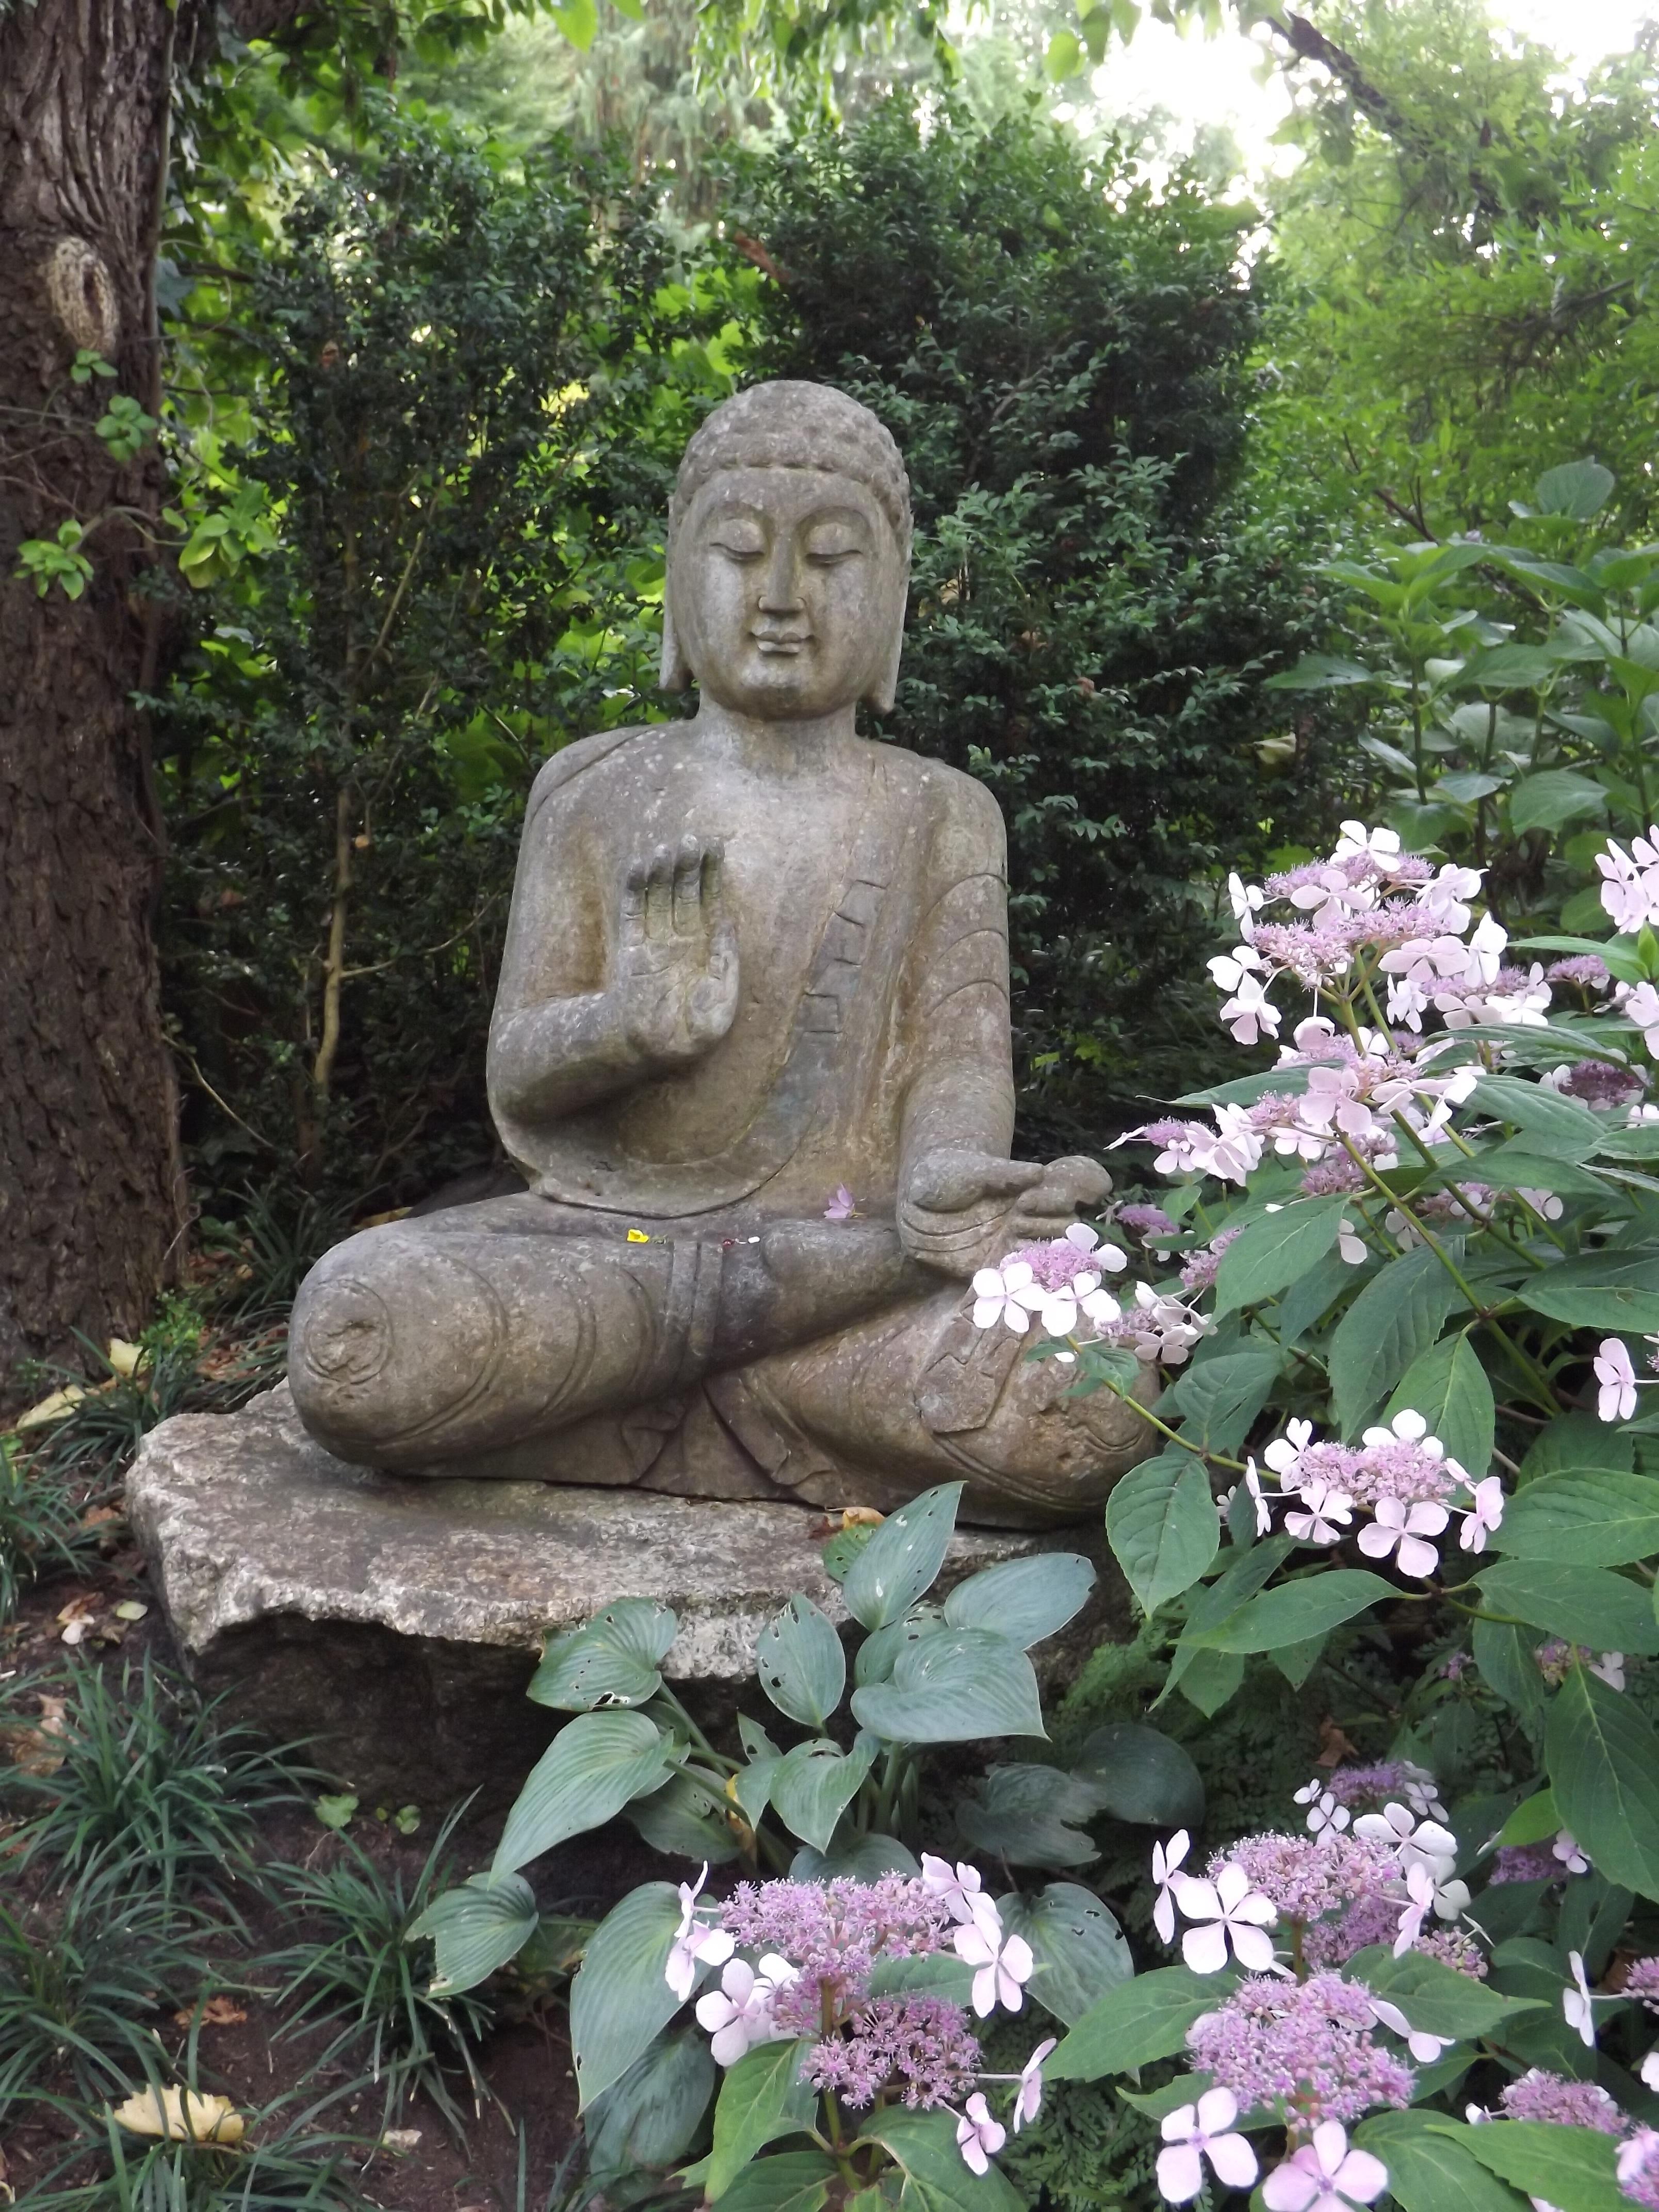 ... Botany, Rest, Zen, Spiritual, Grave, Sculpture, Art, Relaxation,  Figure, Buddha, Harmony, Artfully, Gartendeko, Garden Design, Feng Shui,  Fern Stlich, ...